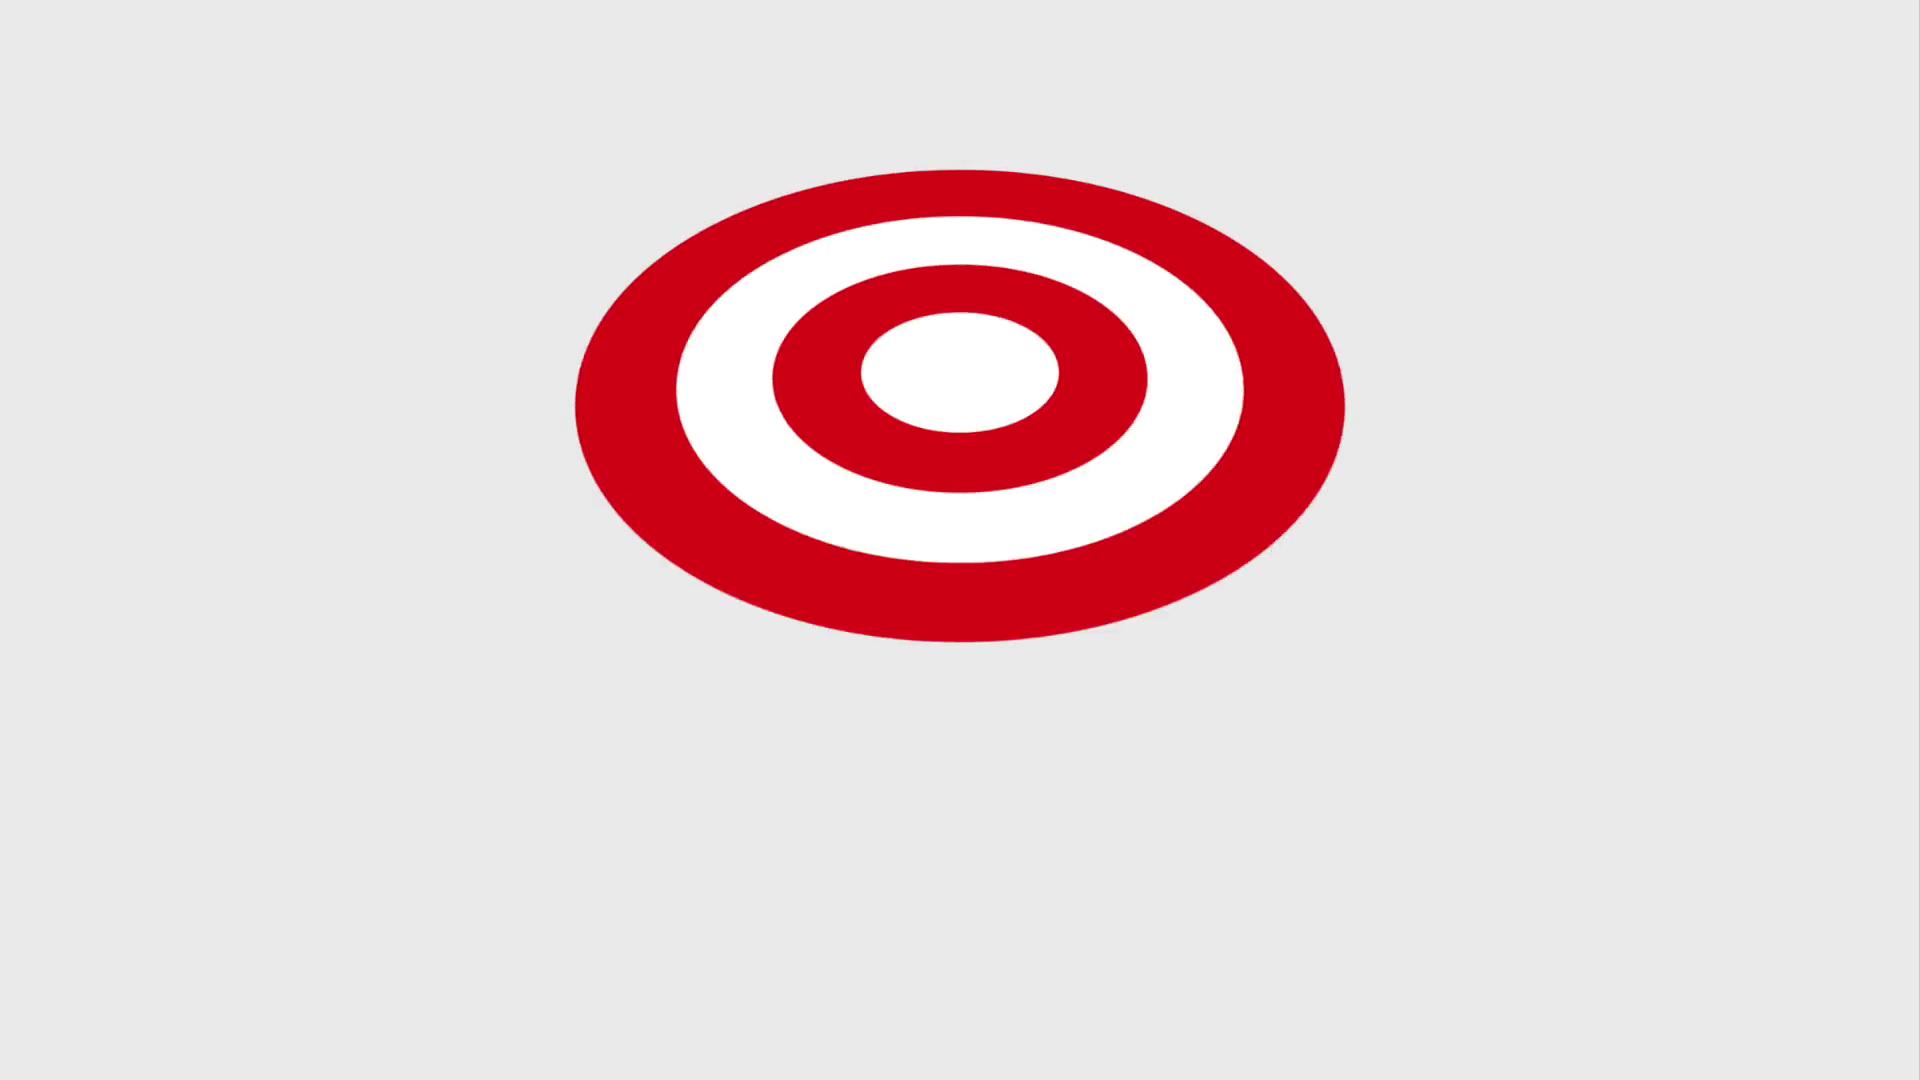 Or target and arrow. Bullseye clipart perfection